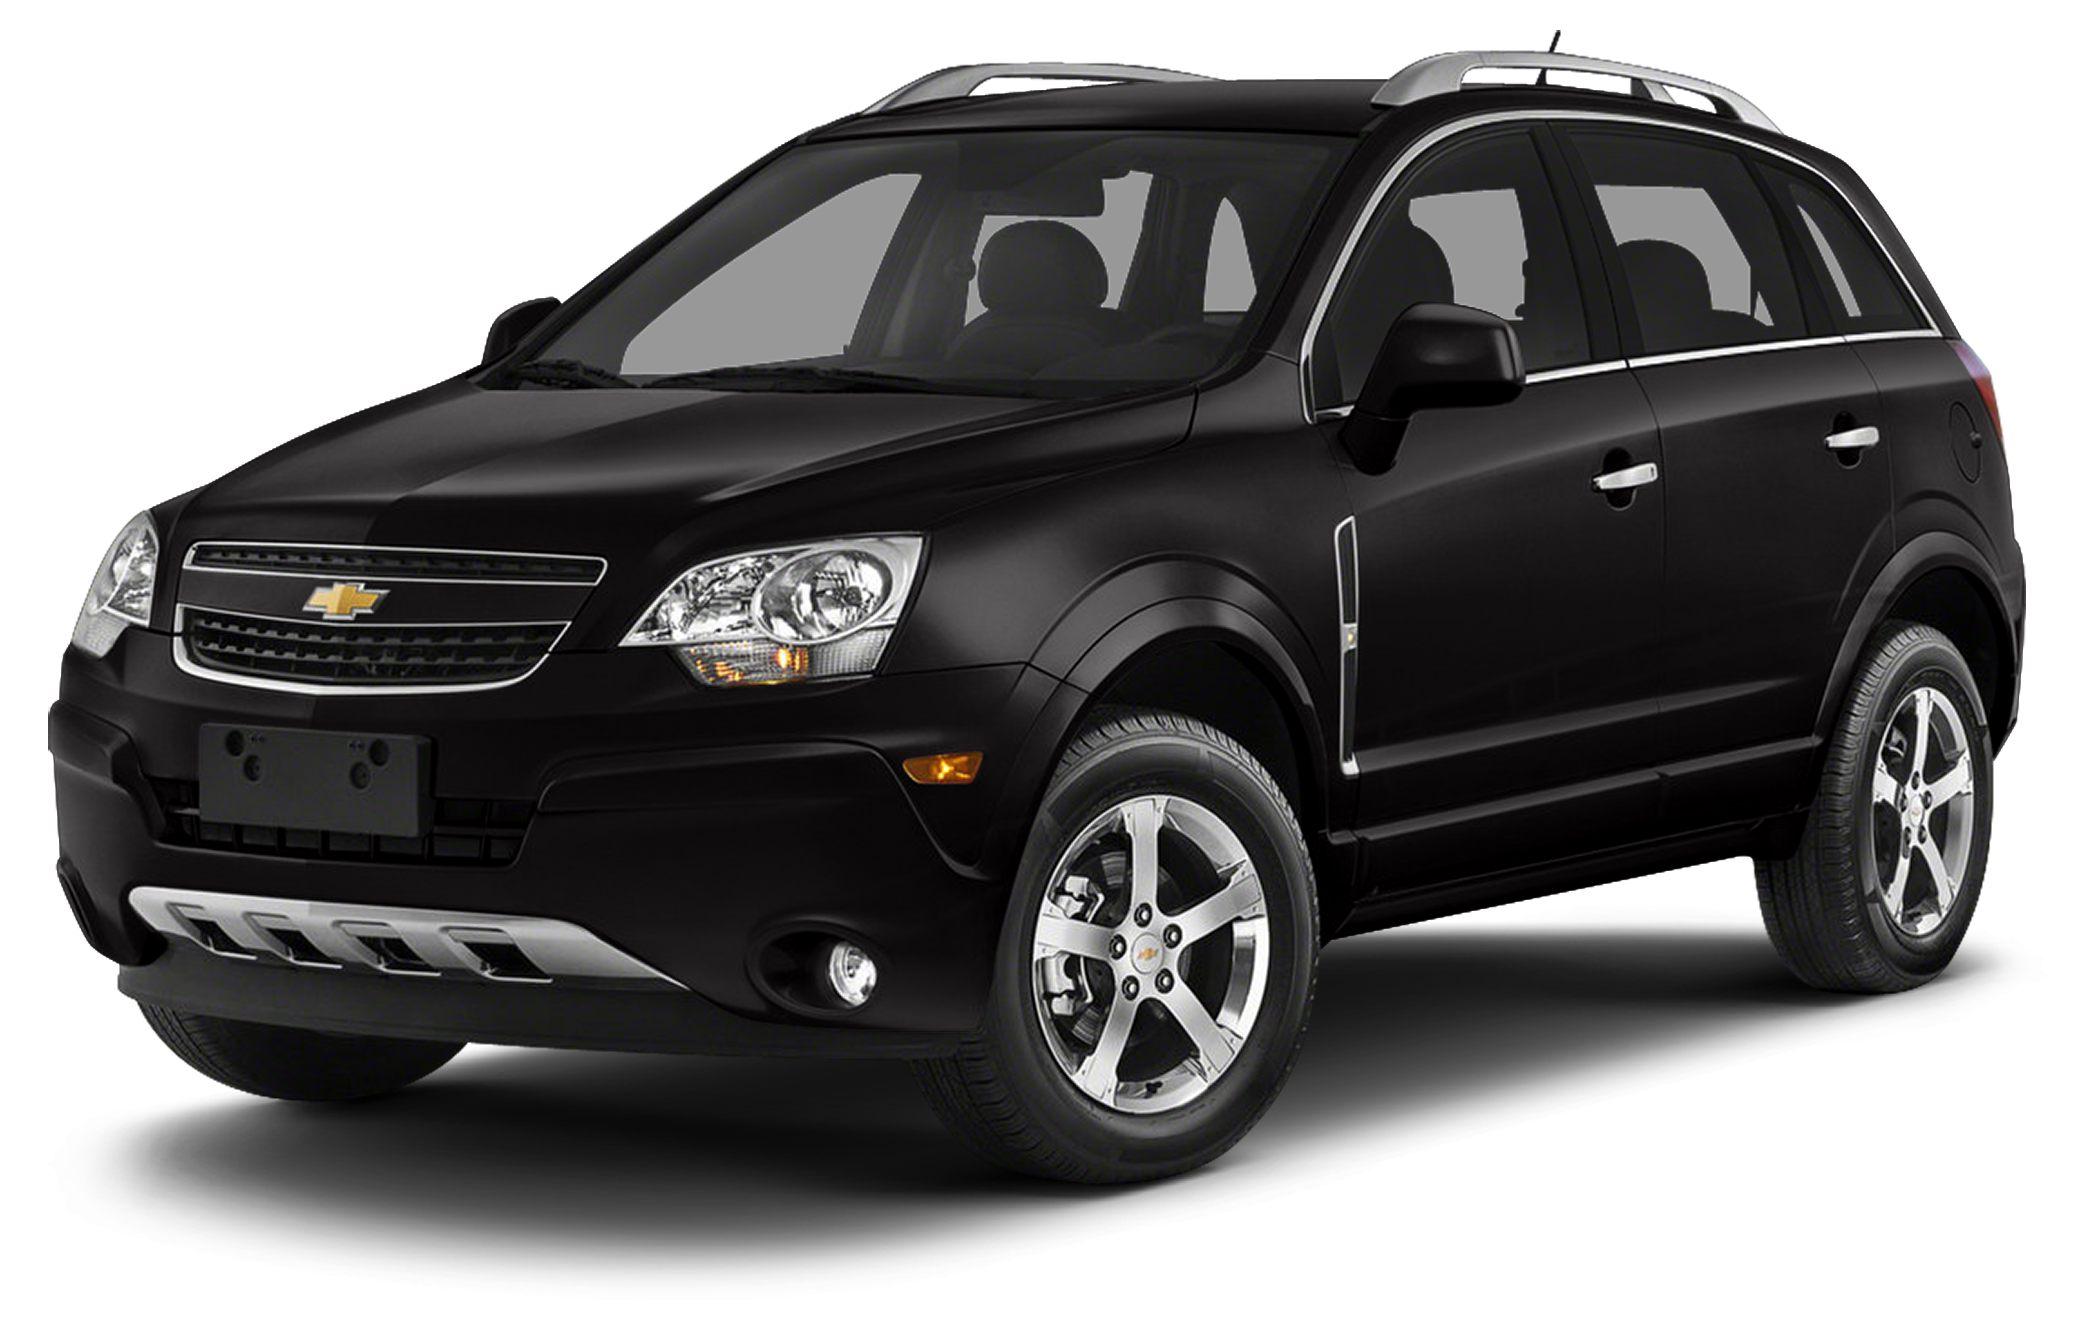 2014 Chevrolet Captiva Suv In Oklahoma For Sale ▷ Used Cars